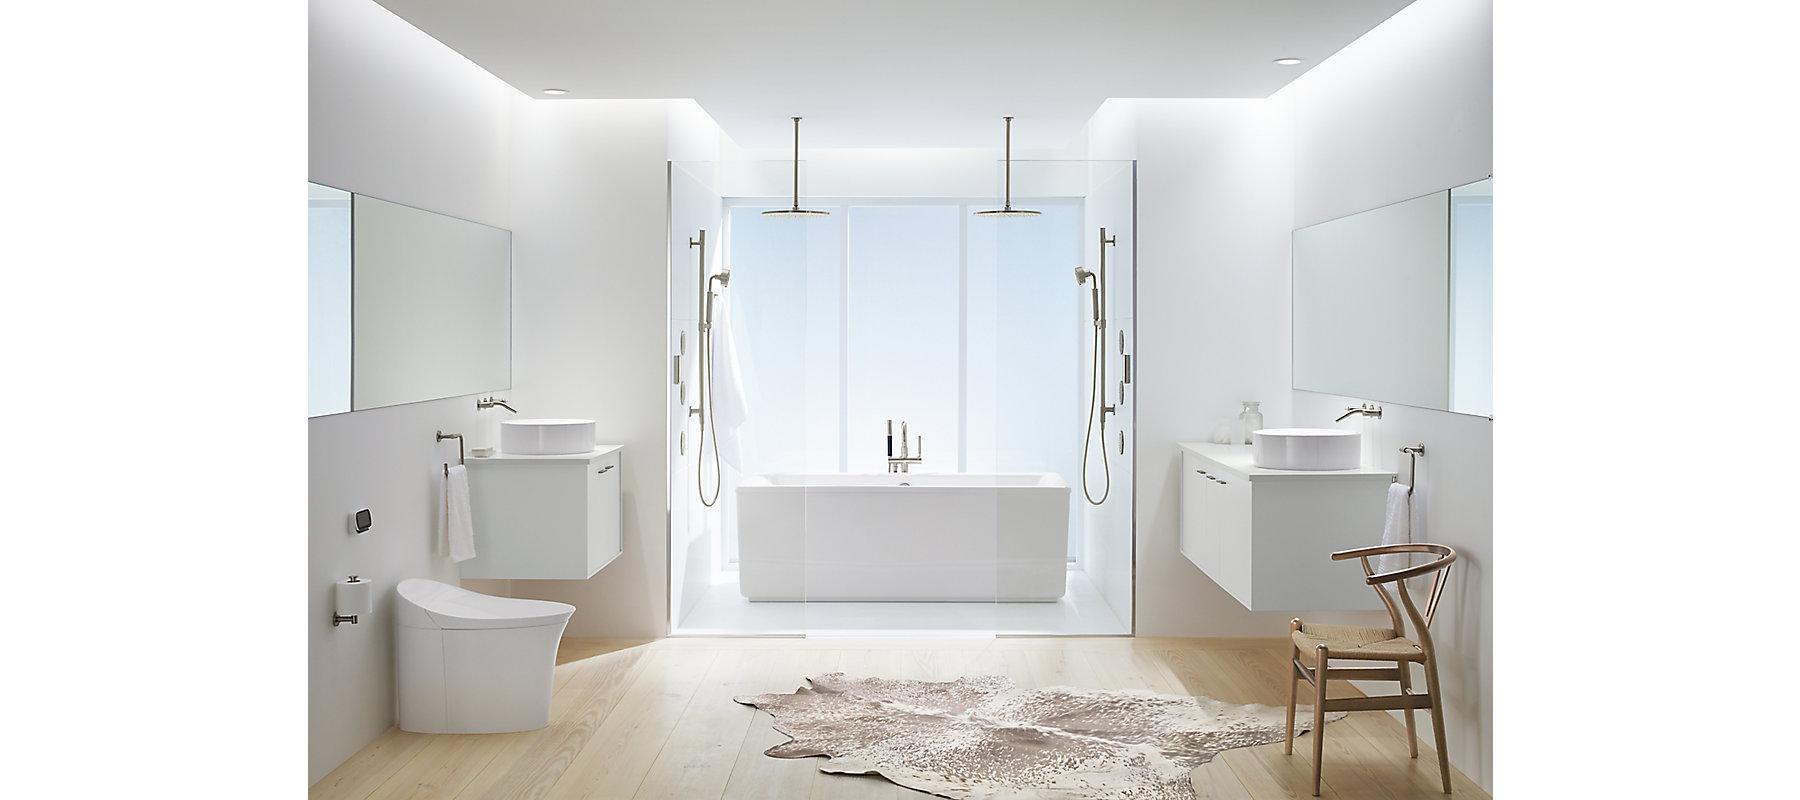 Bathroom Designs Kohler kohler | toilets, showers, sinks, faucets and more for bathroom